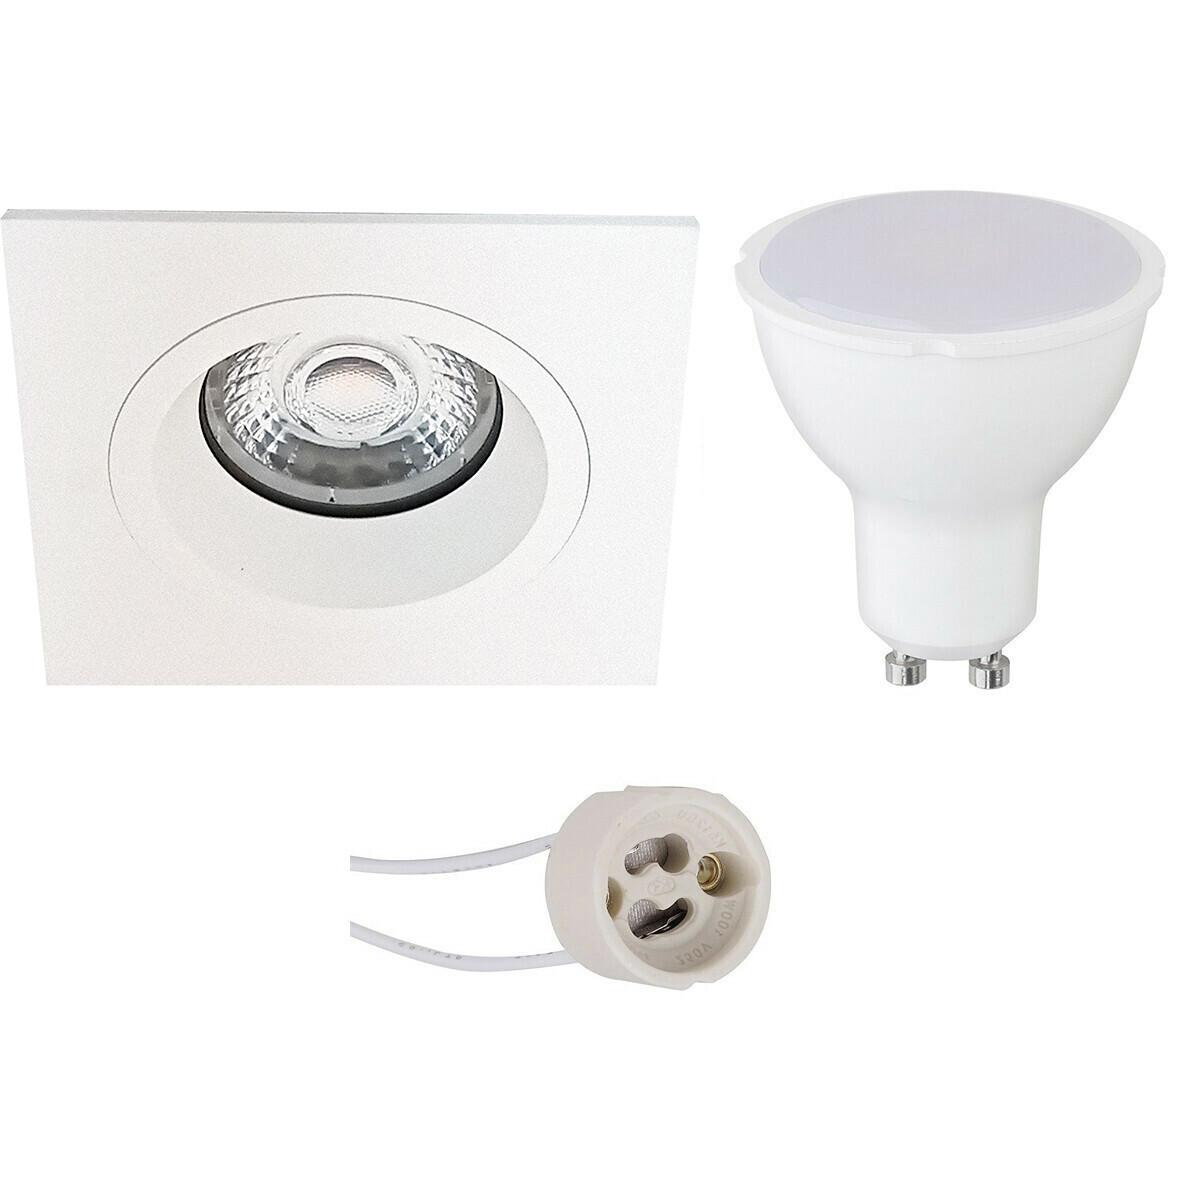 LED Spot Set - Pragmi Rodos Pro - GU10 Fitting - Inbouw Vierkant - Mat Wit - 4W - Helder/Koud Wit 64